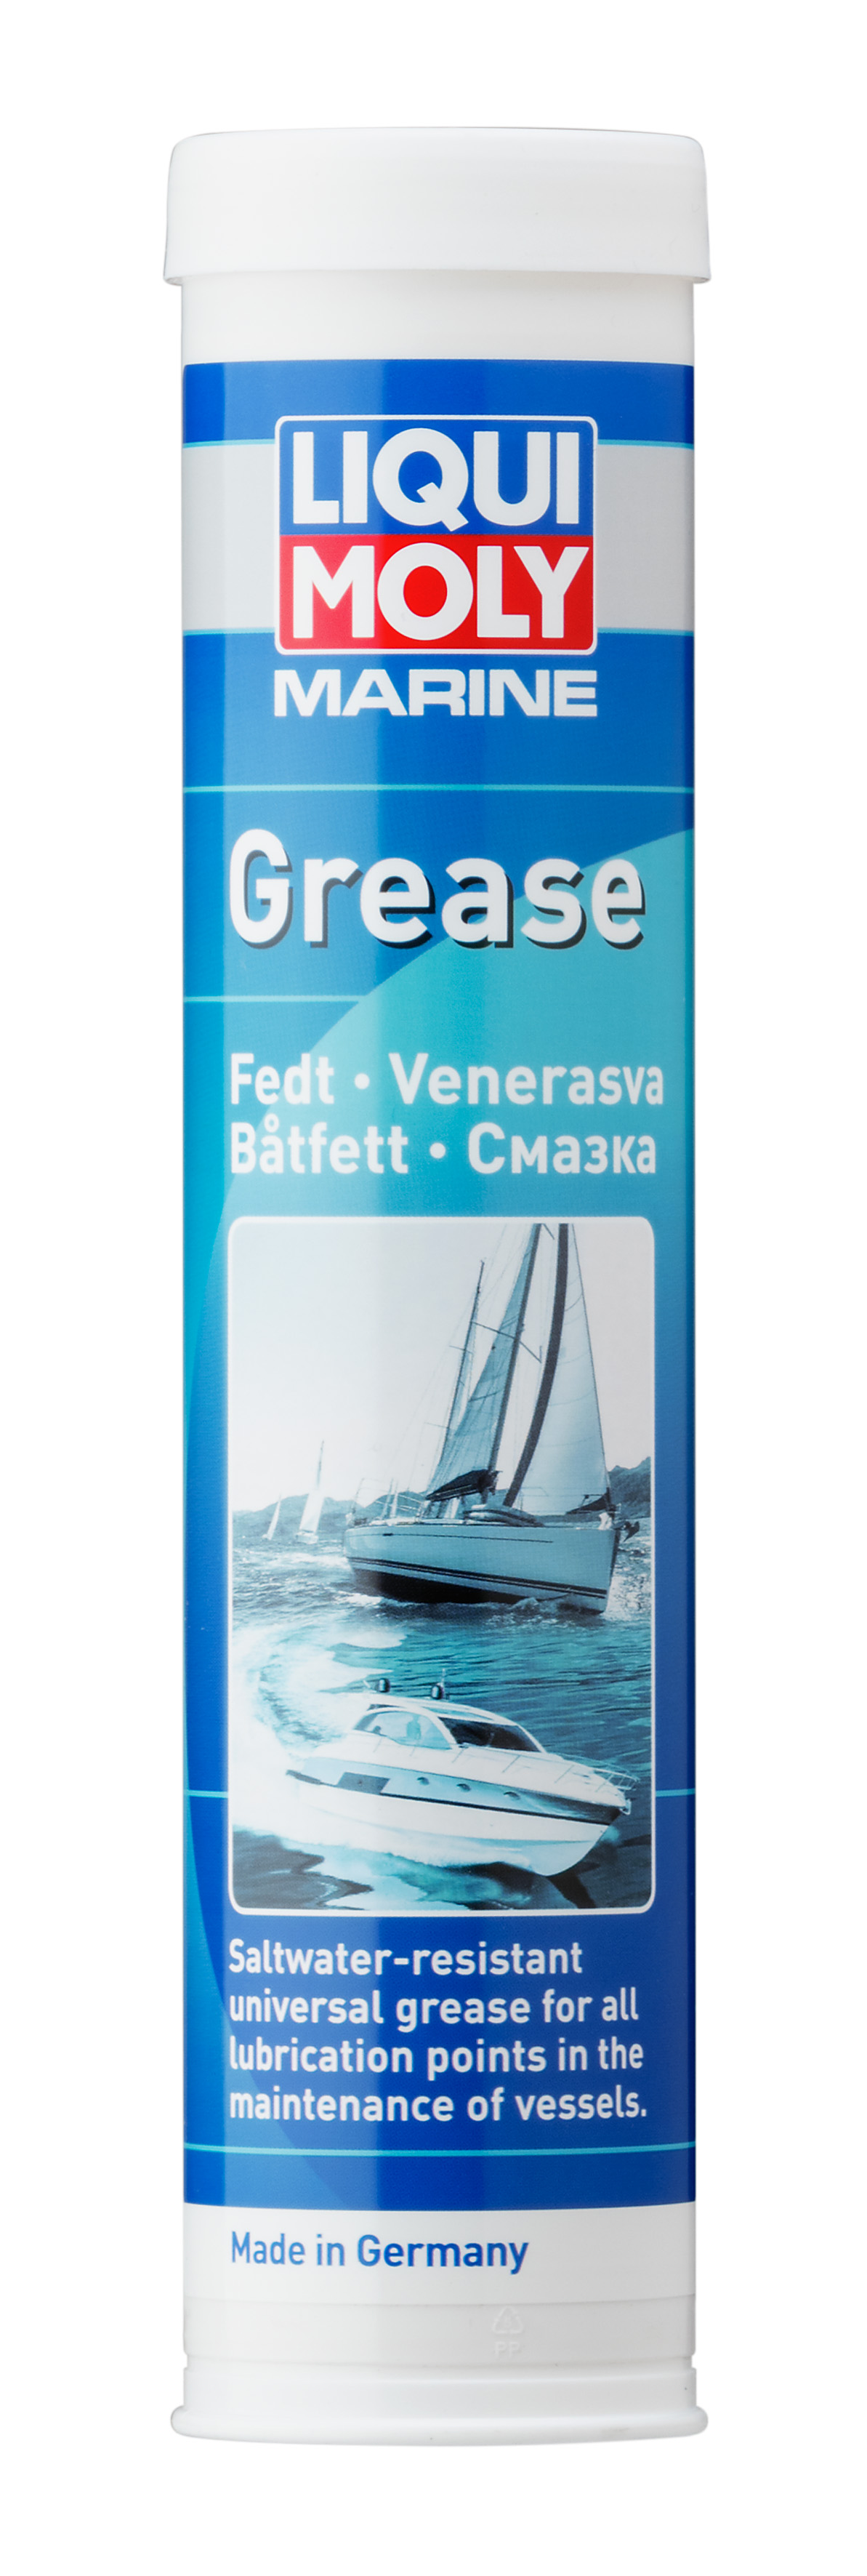 Смазка для водной техники Marine Grease